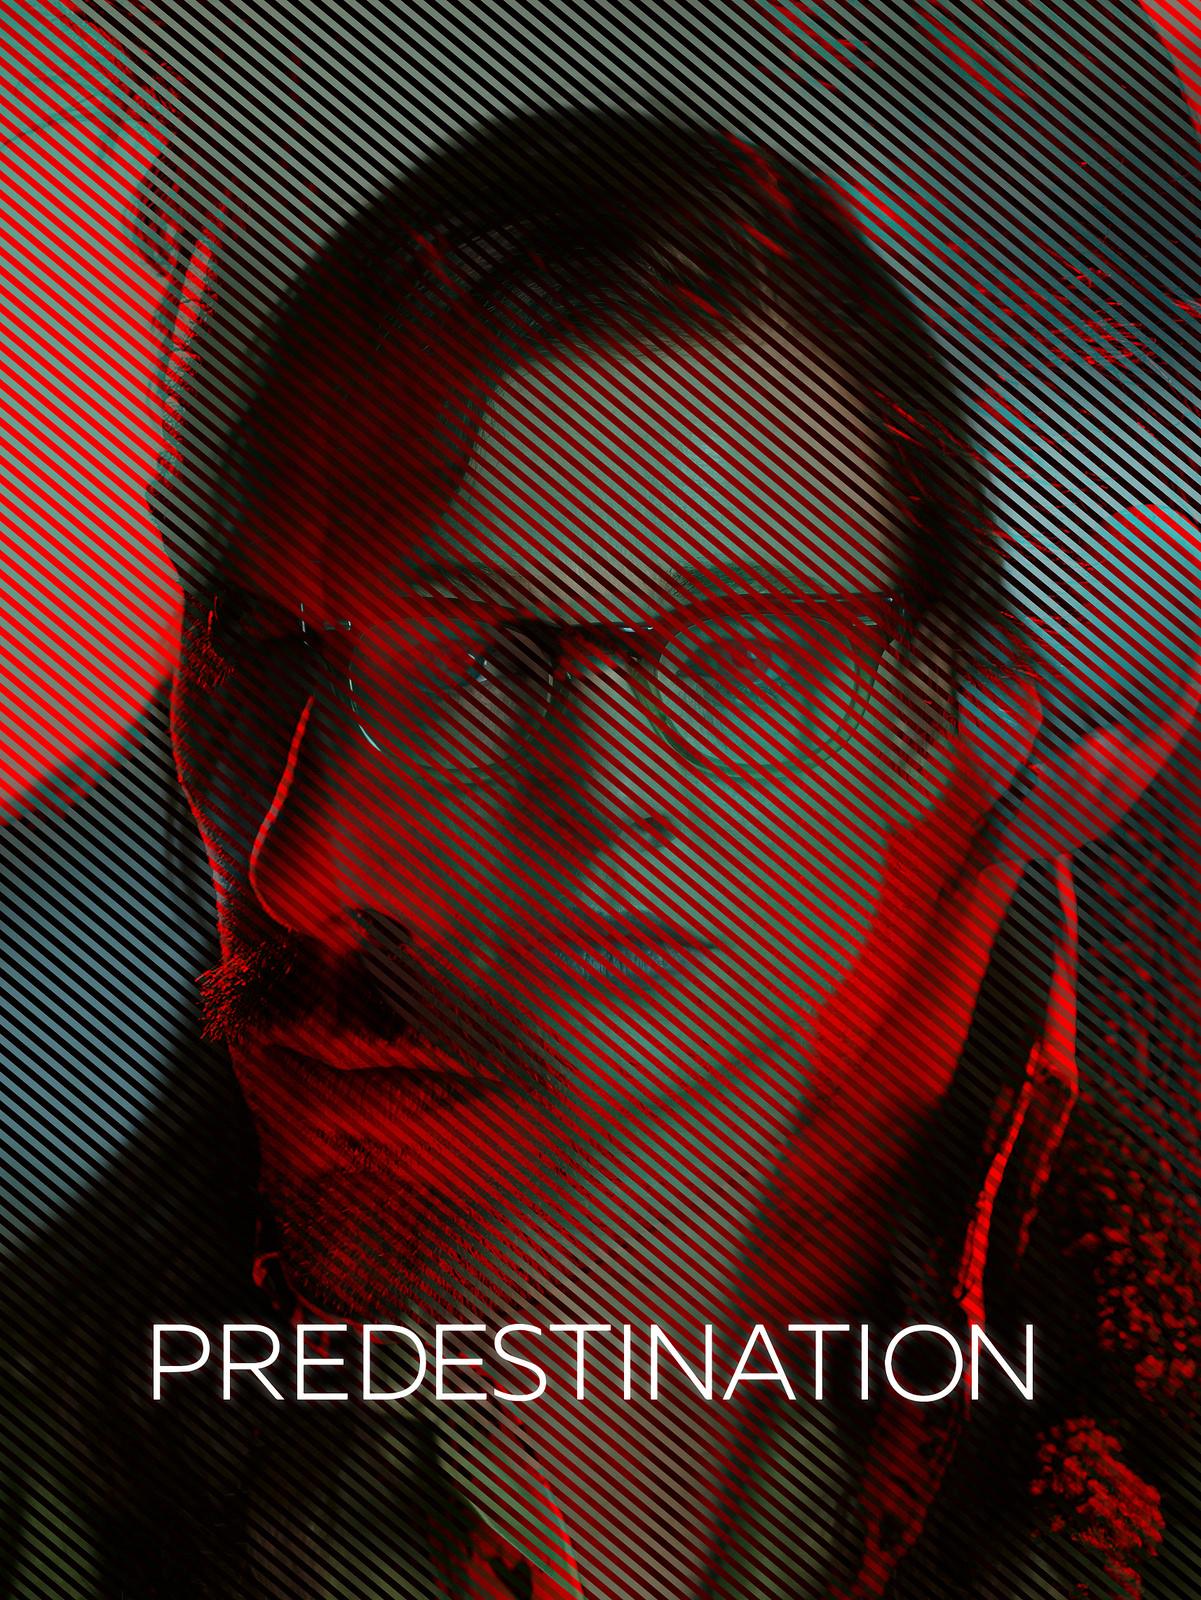 predestination 2014 poster wwwpixsharkcom images